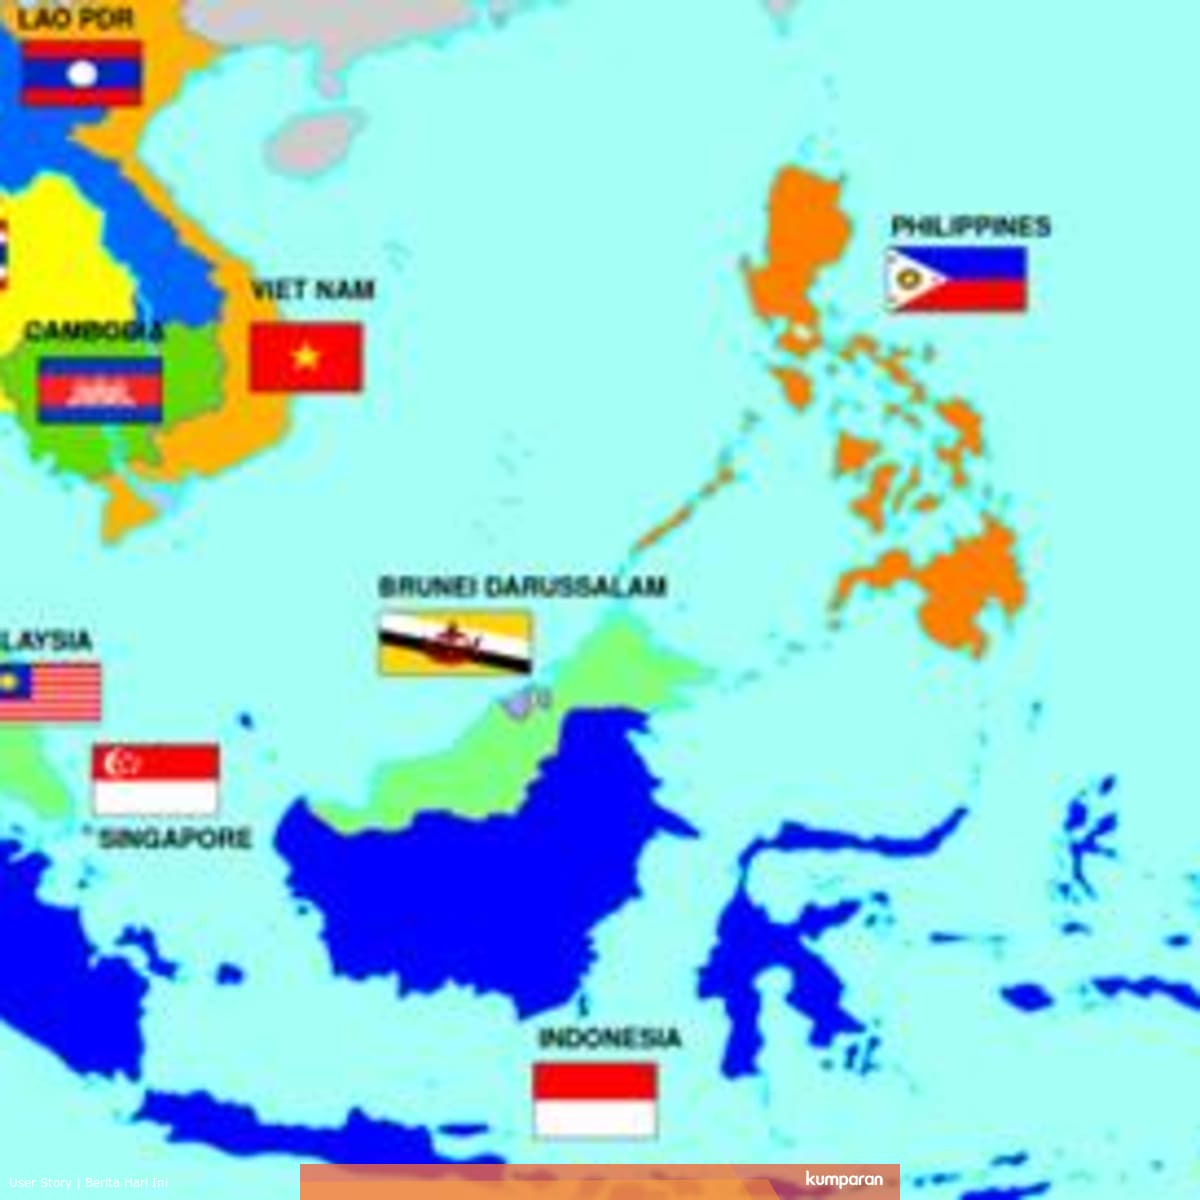 Kondisi Geografis Negara Asean Berdasarkan Peta Kumparan Com